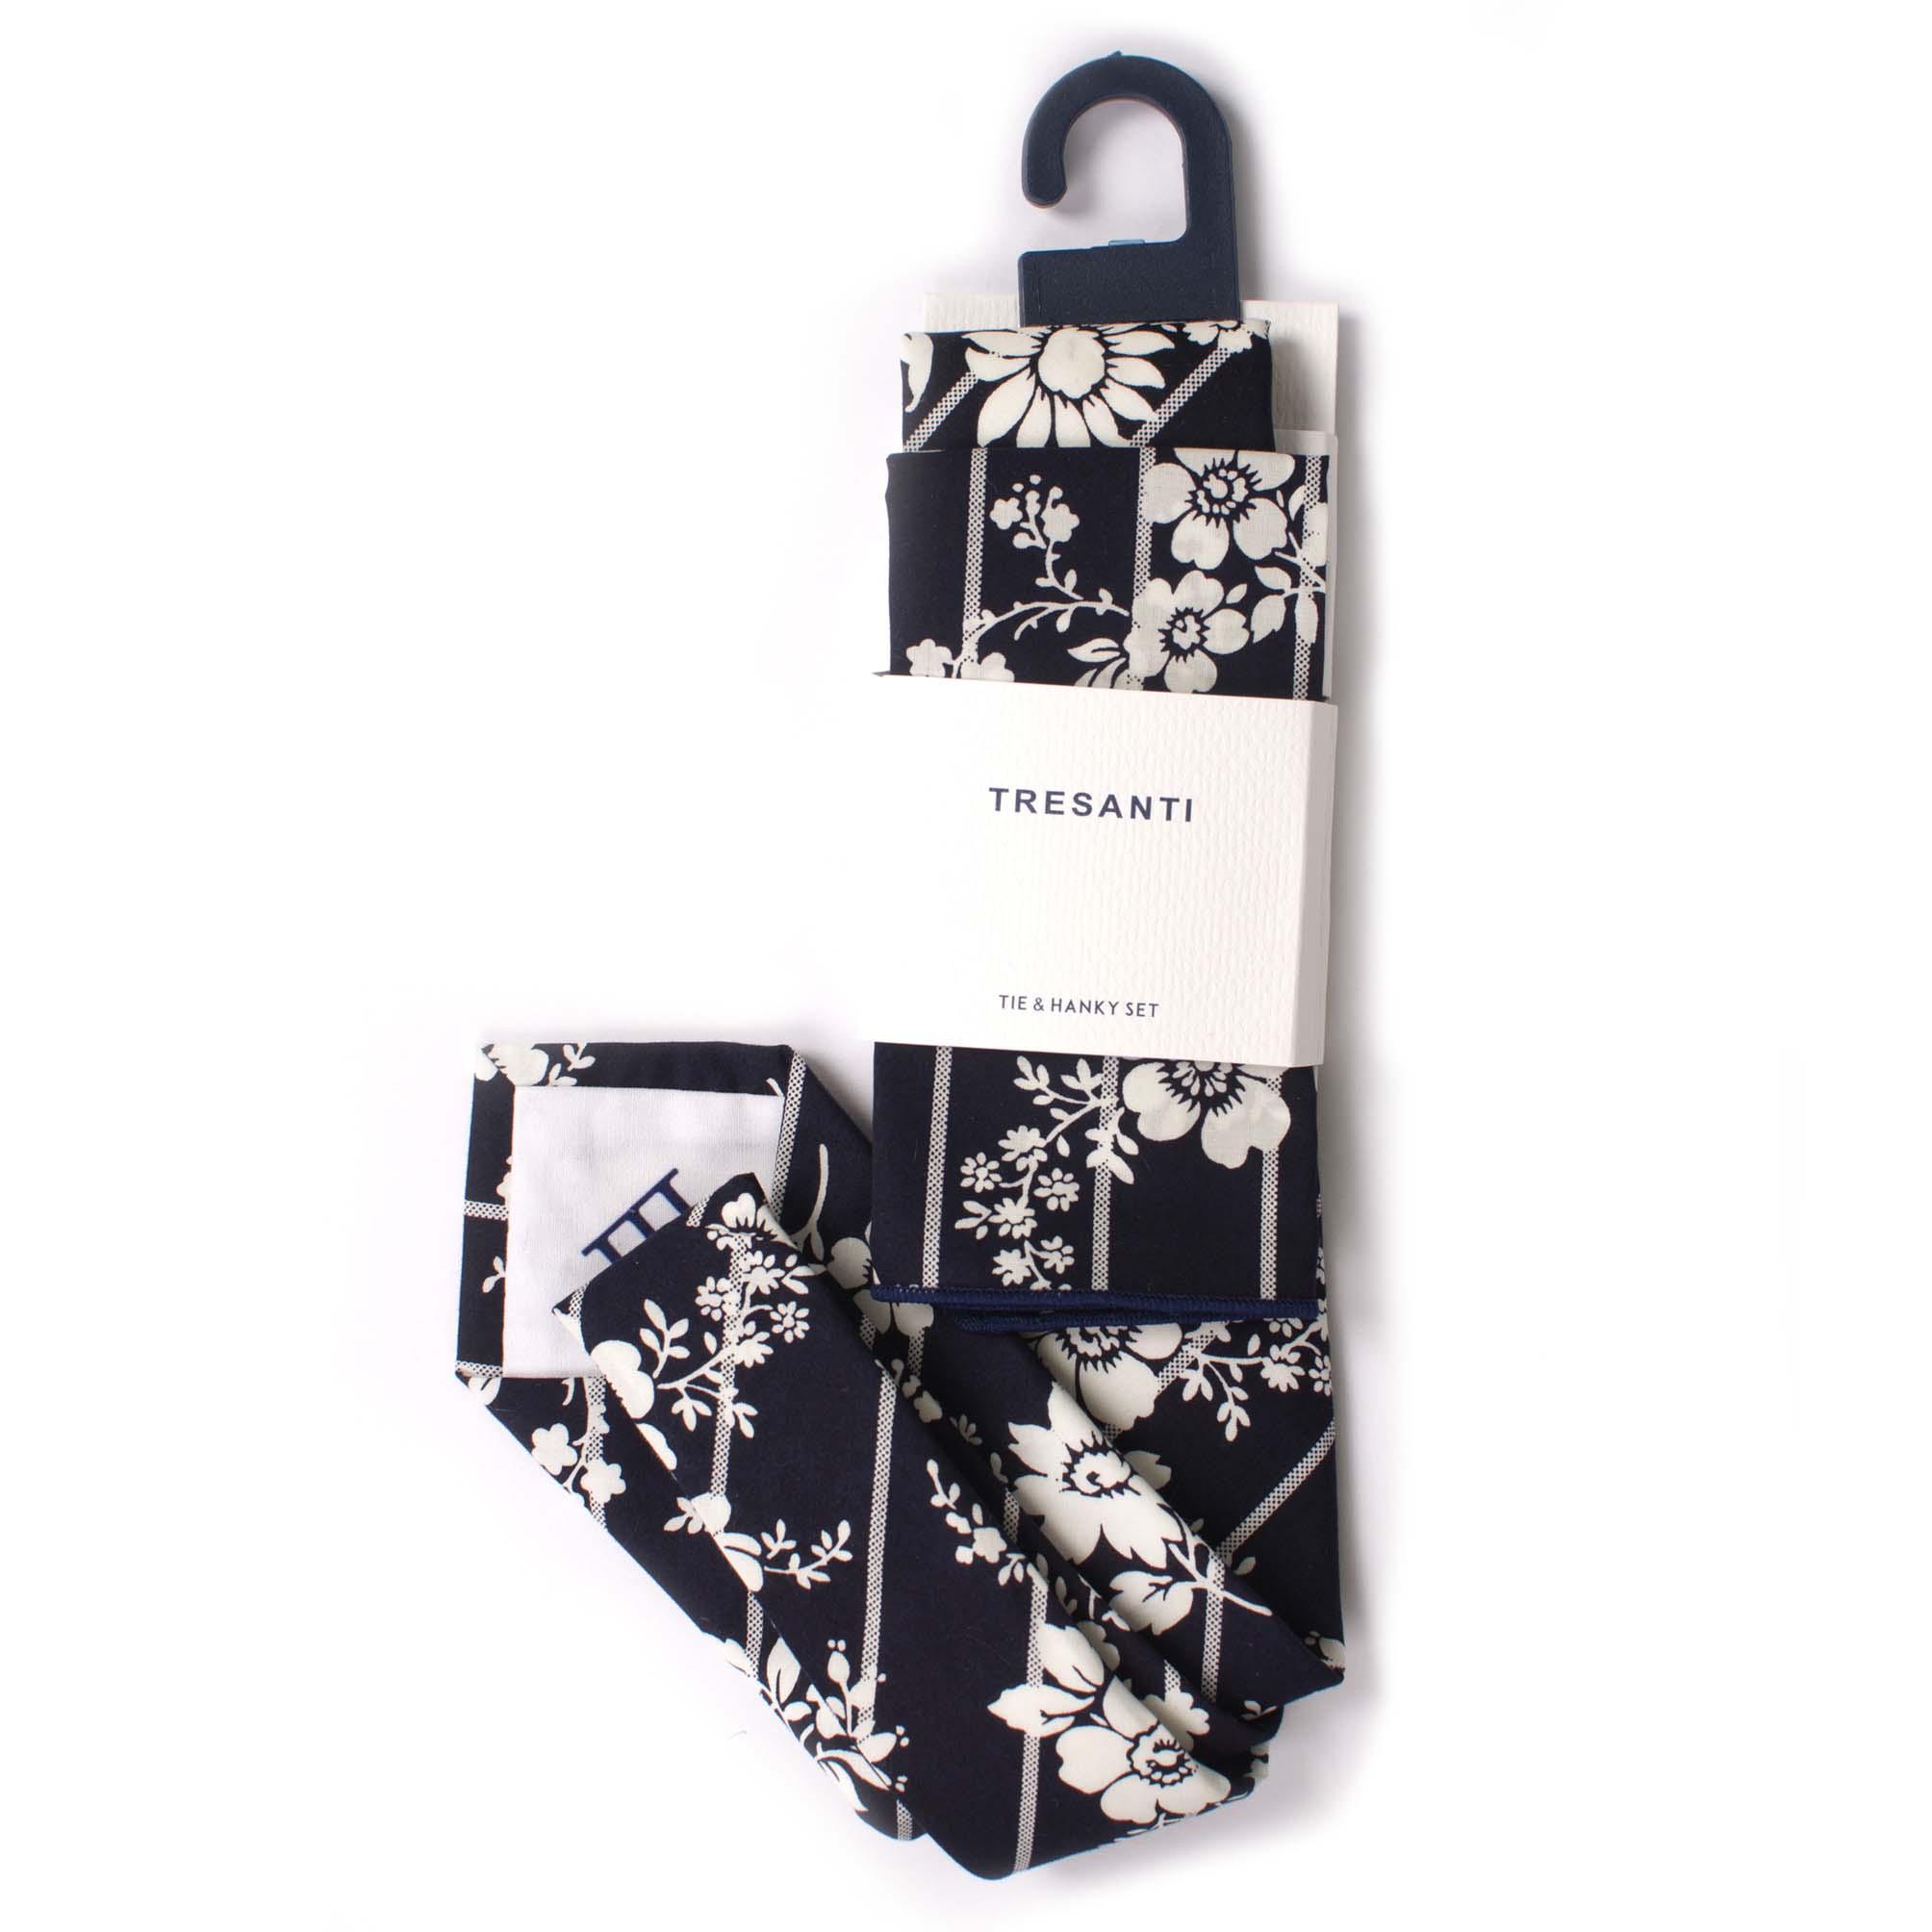 Tie & hanky set cotton flower design